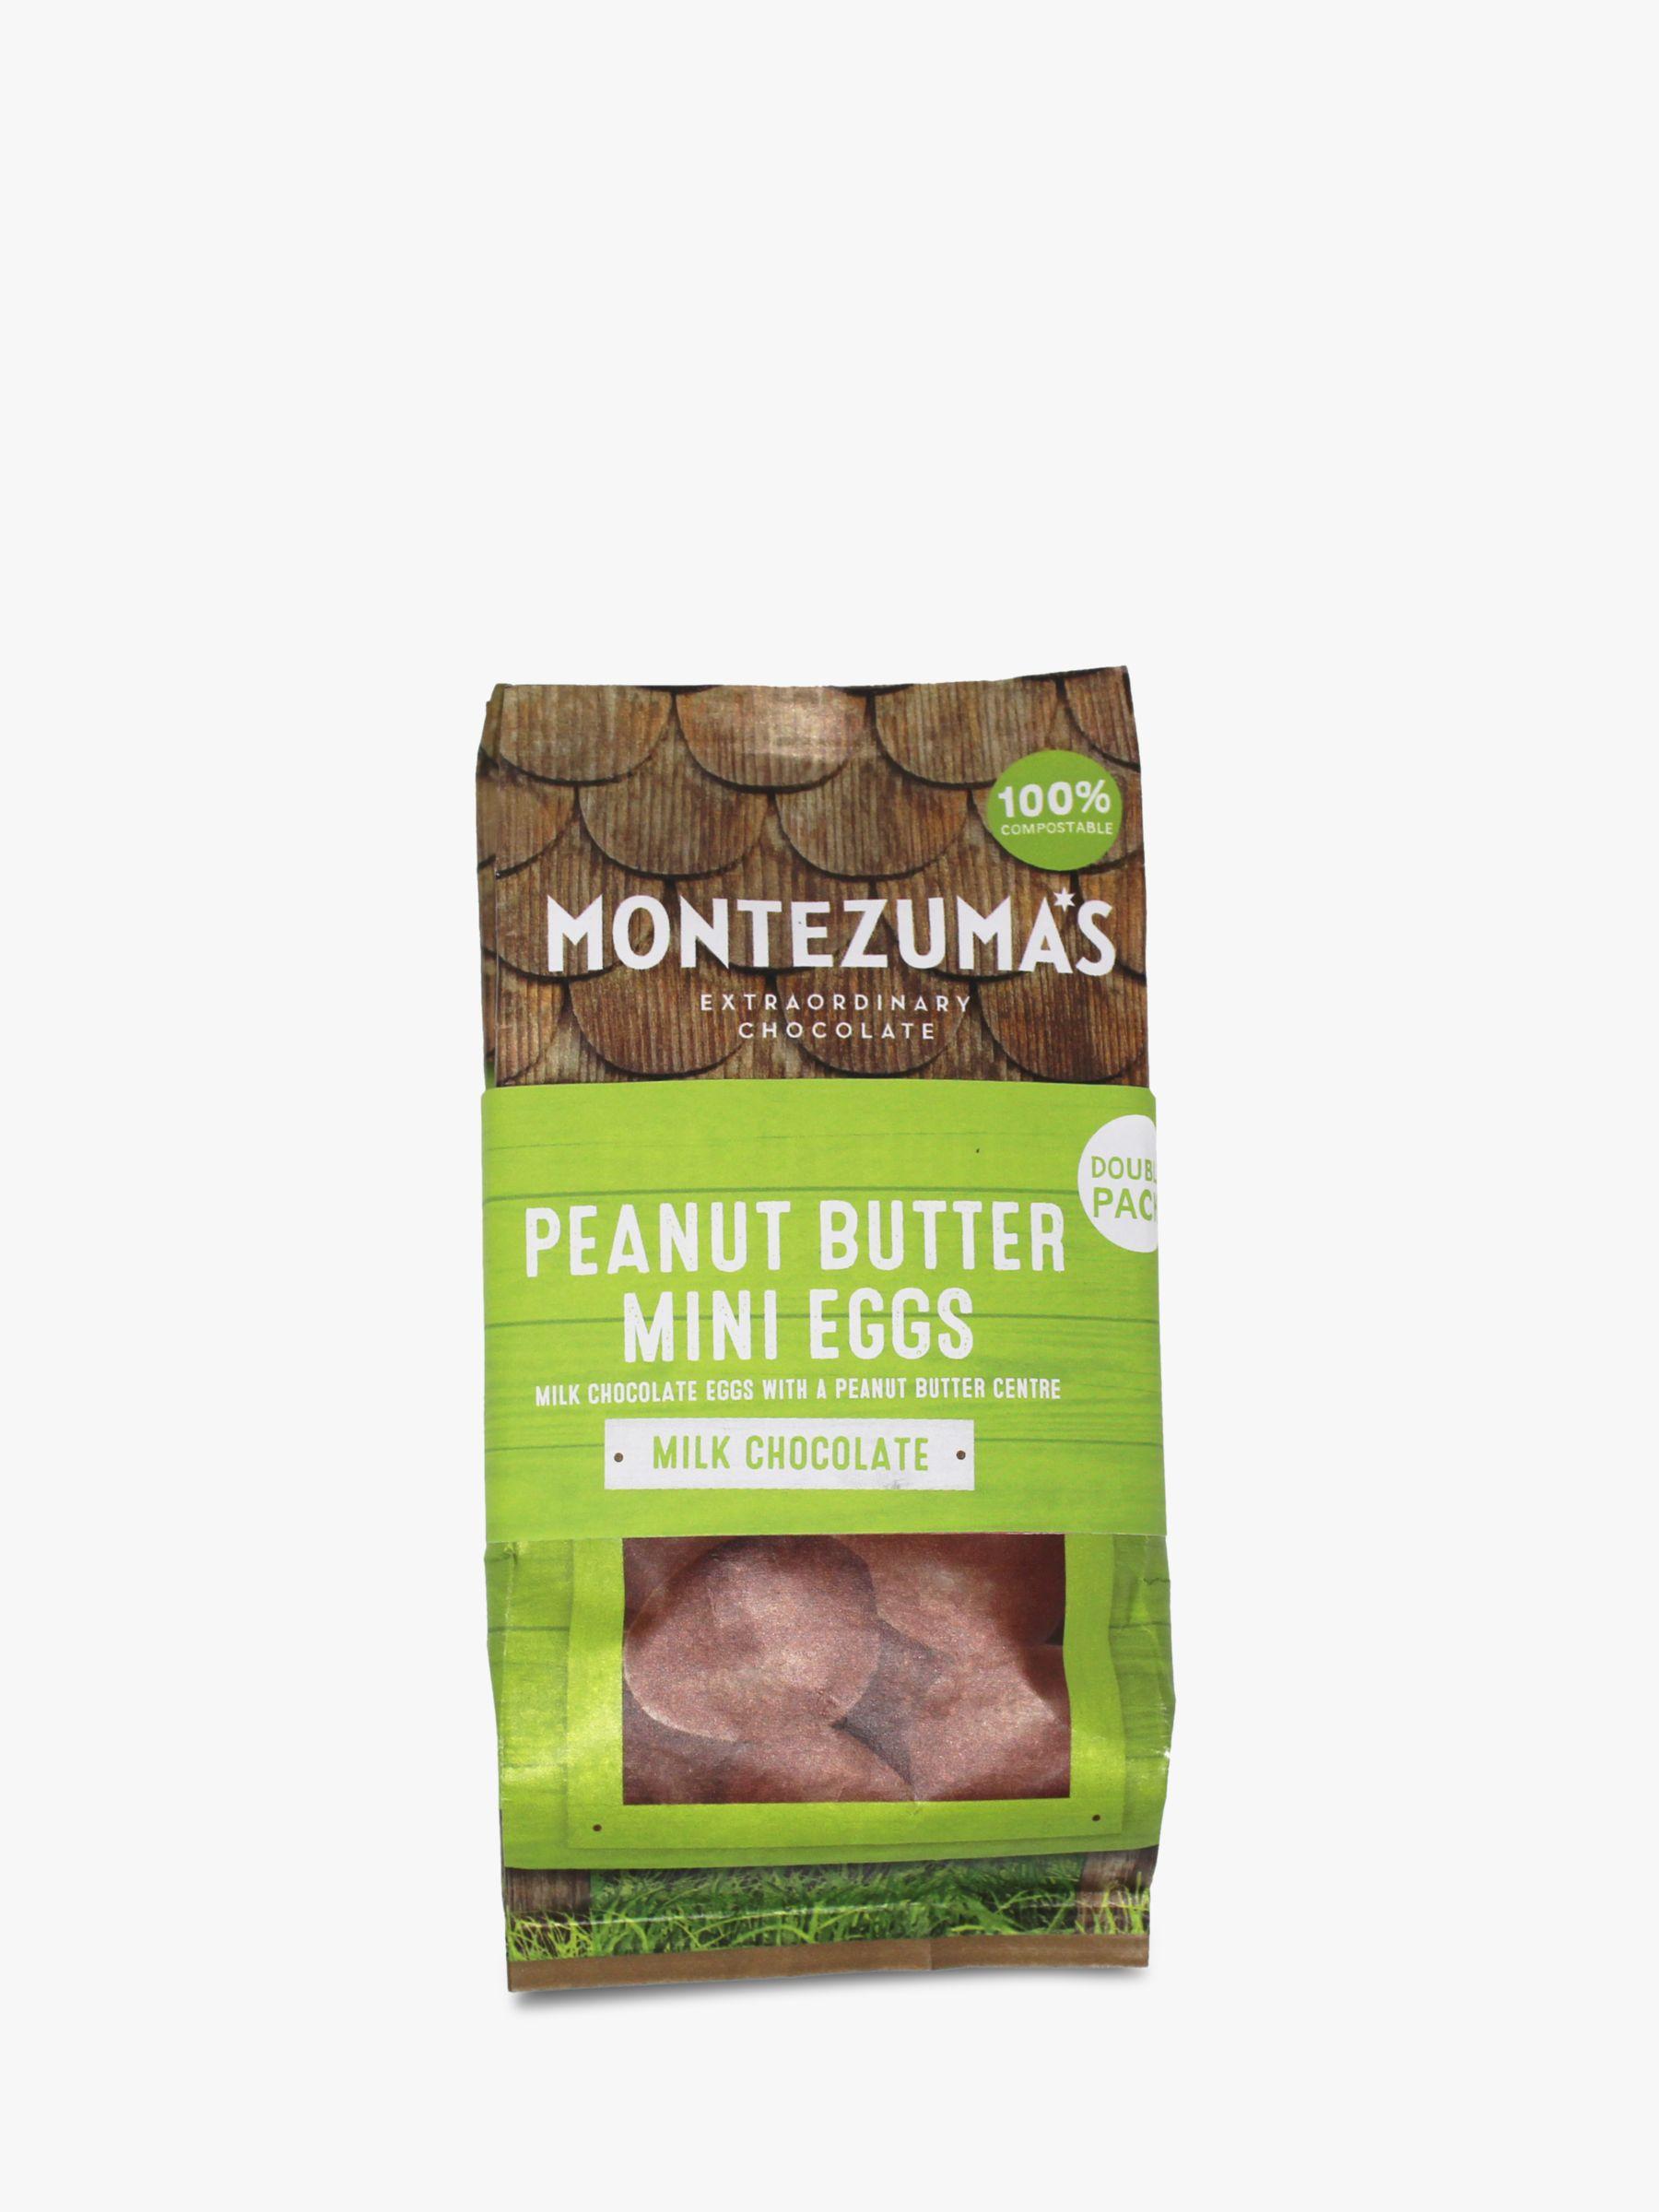 Montezuma's Montezuma's Milk Chocolate Peanut Butter Mini Eggs, Pack of 2, 300g